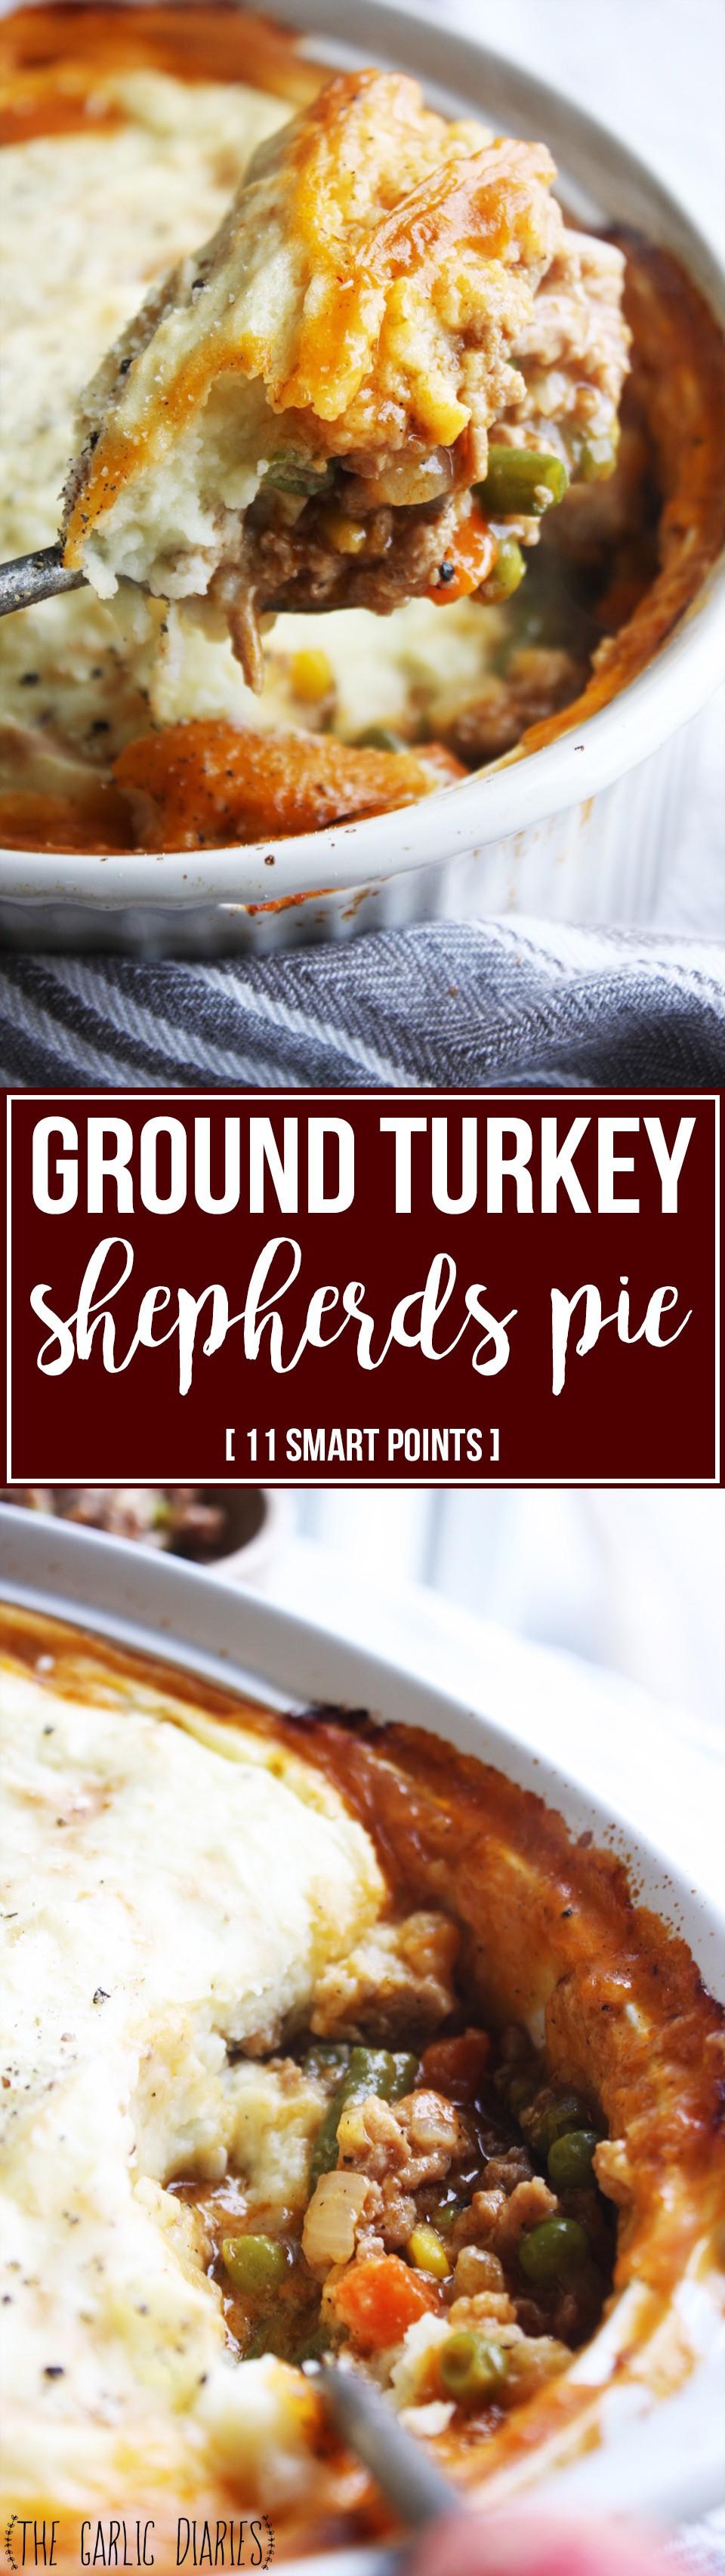 Ground Turkey Shepherd'S Pie  Ground Turkey Shepherd's Pie